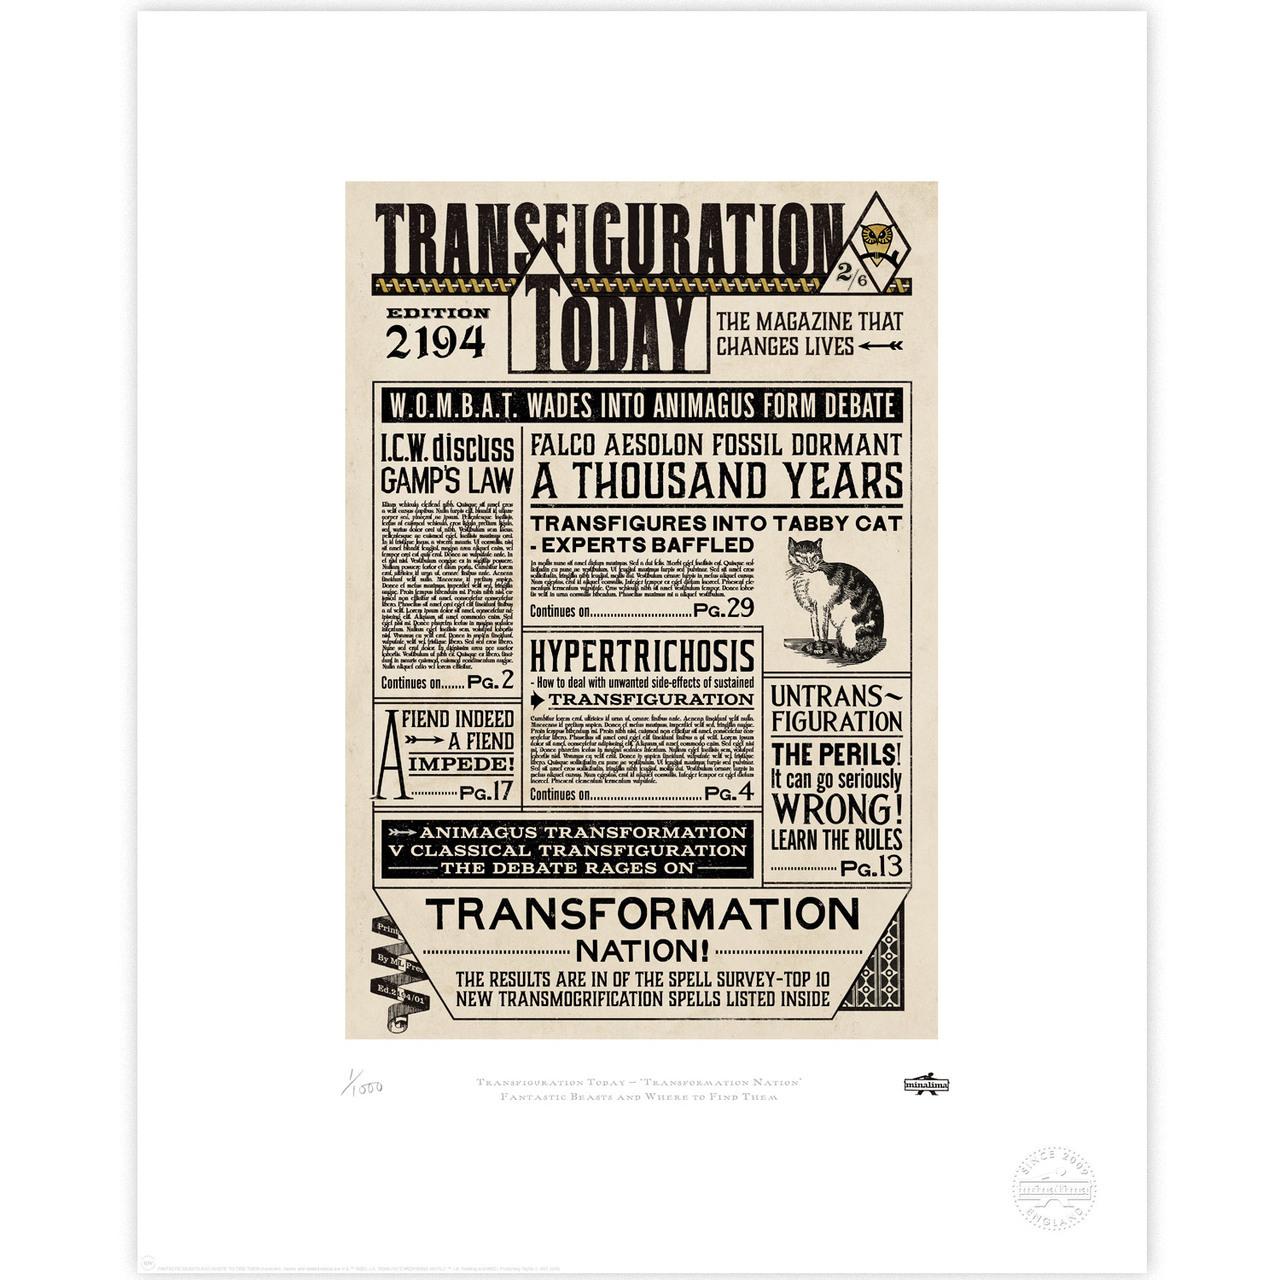 Transfiguration Today: Transformation Nation